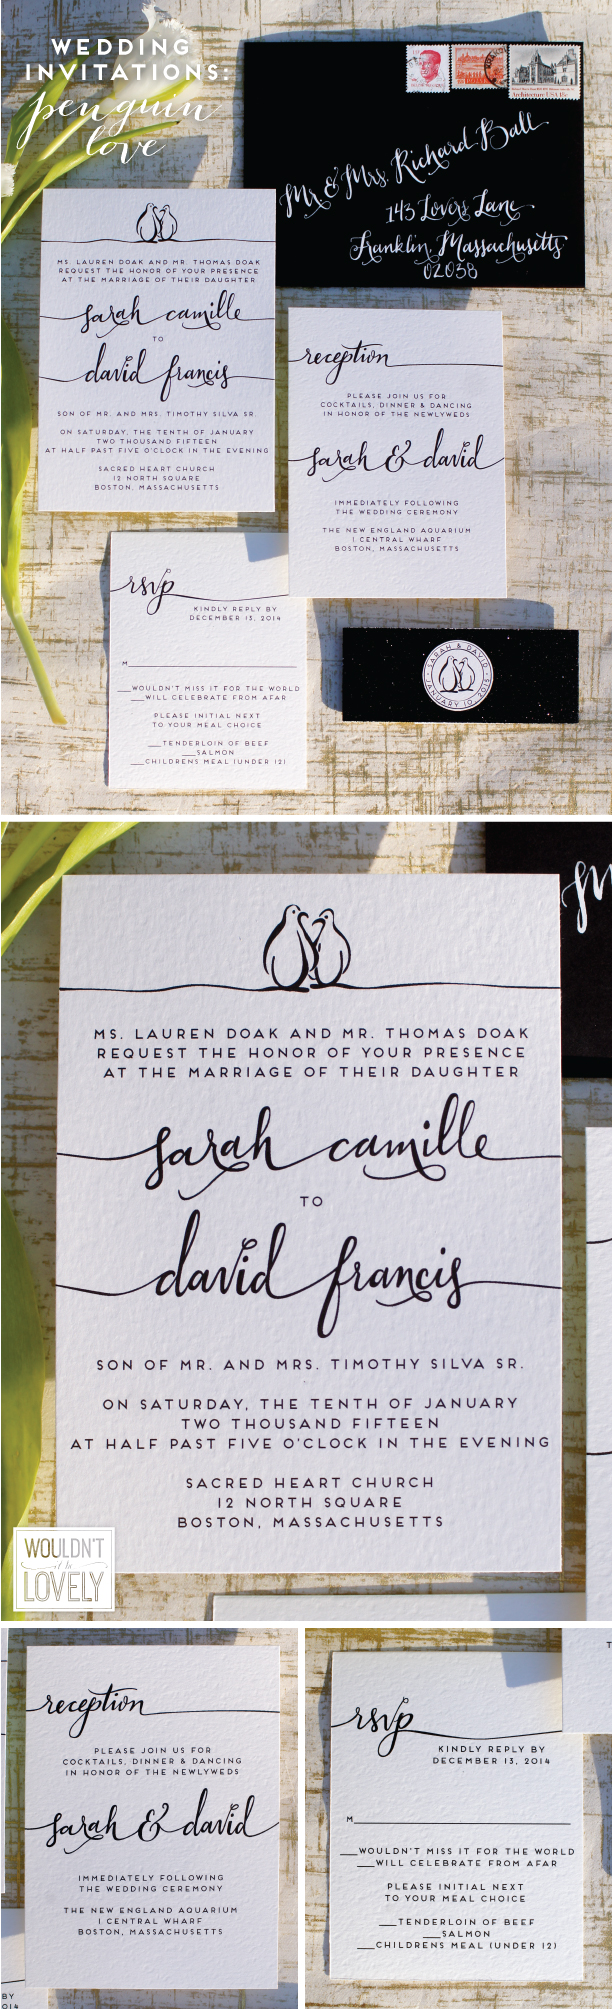 black and white custom designed wedding invitation suite with penguins